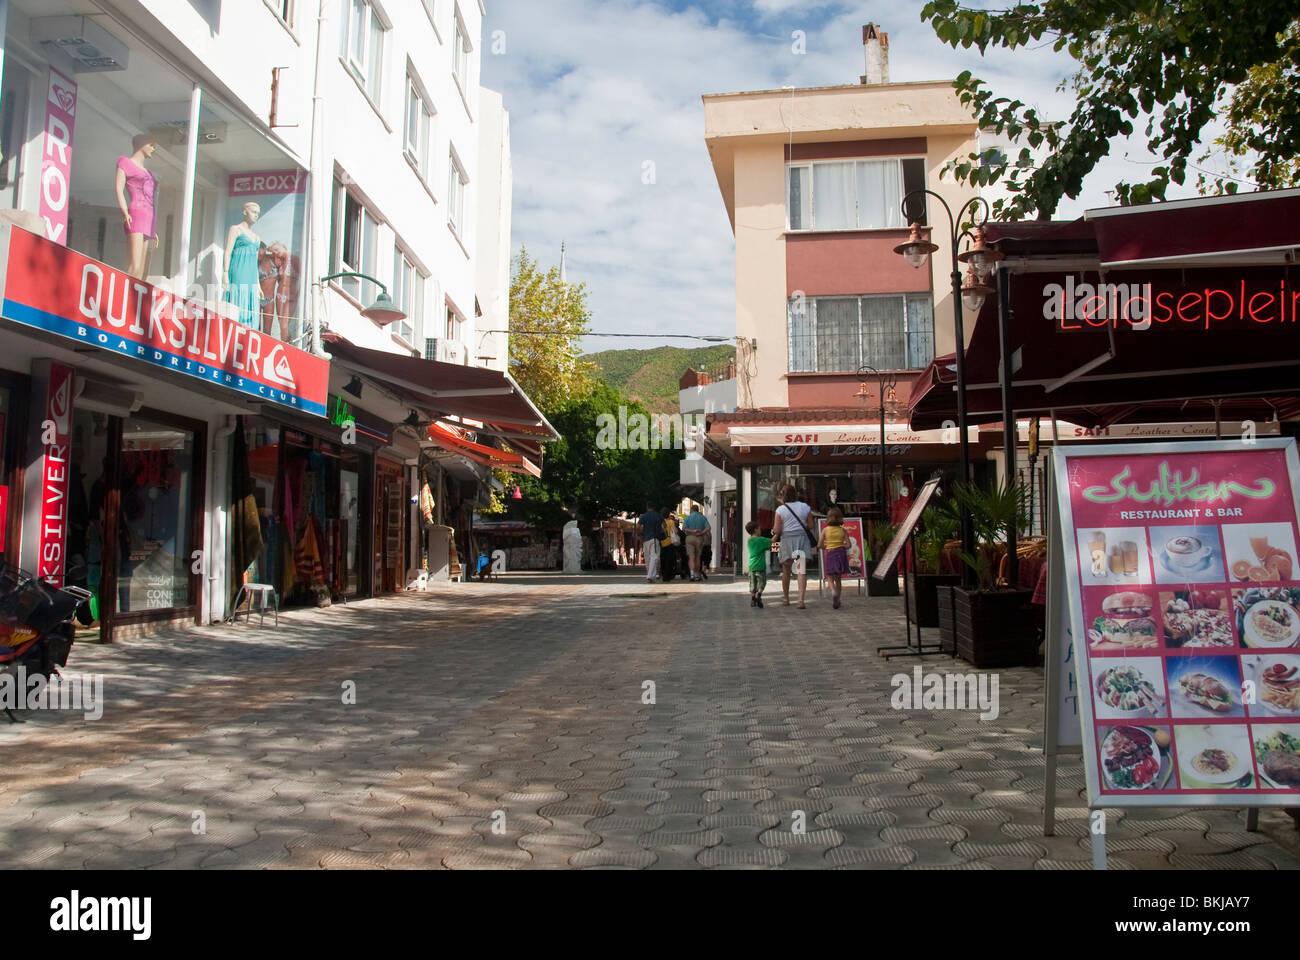 Shops & Restaurant in Marmaris Turkey Stock Photo